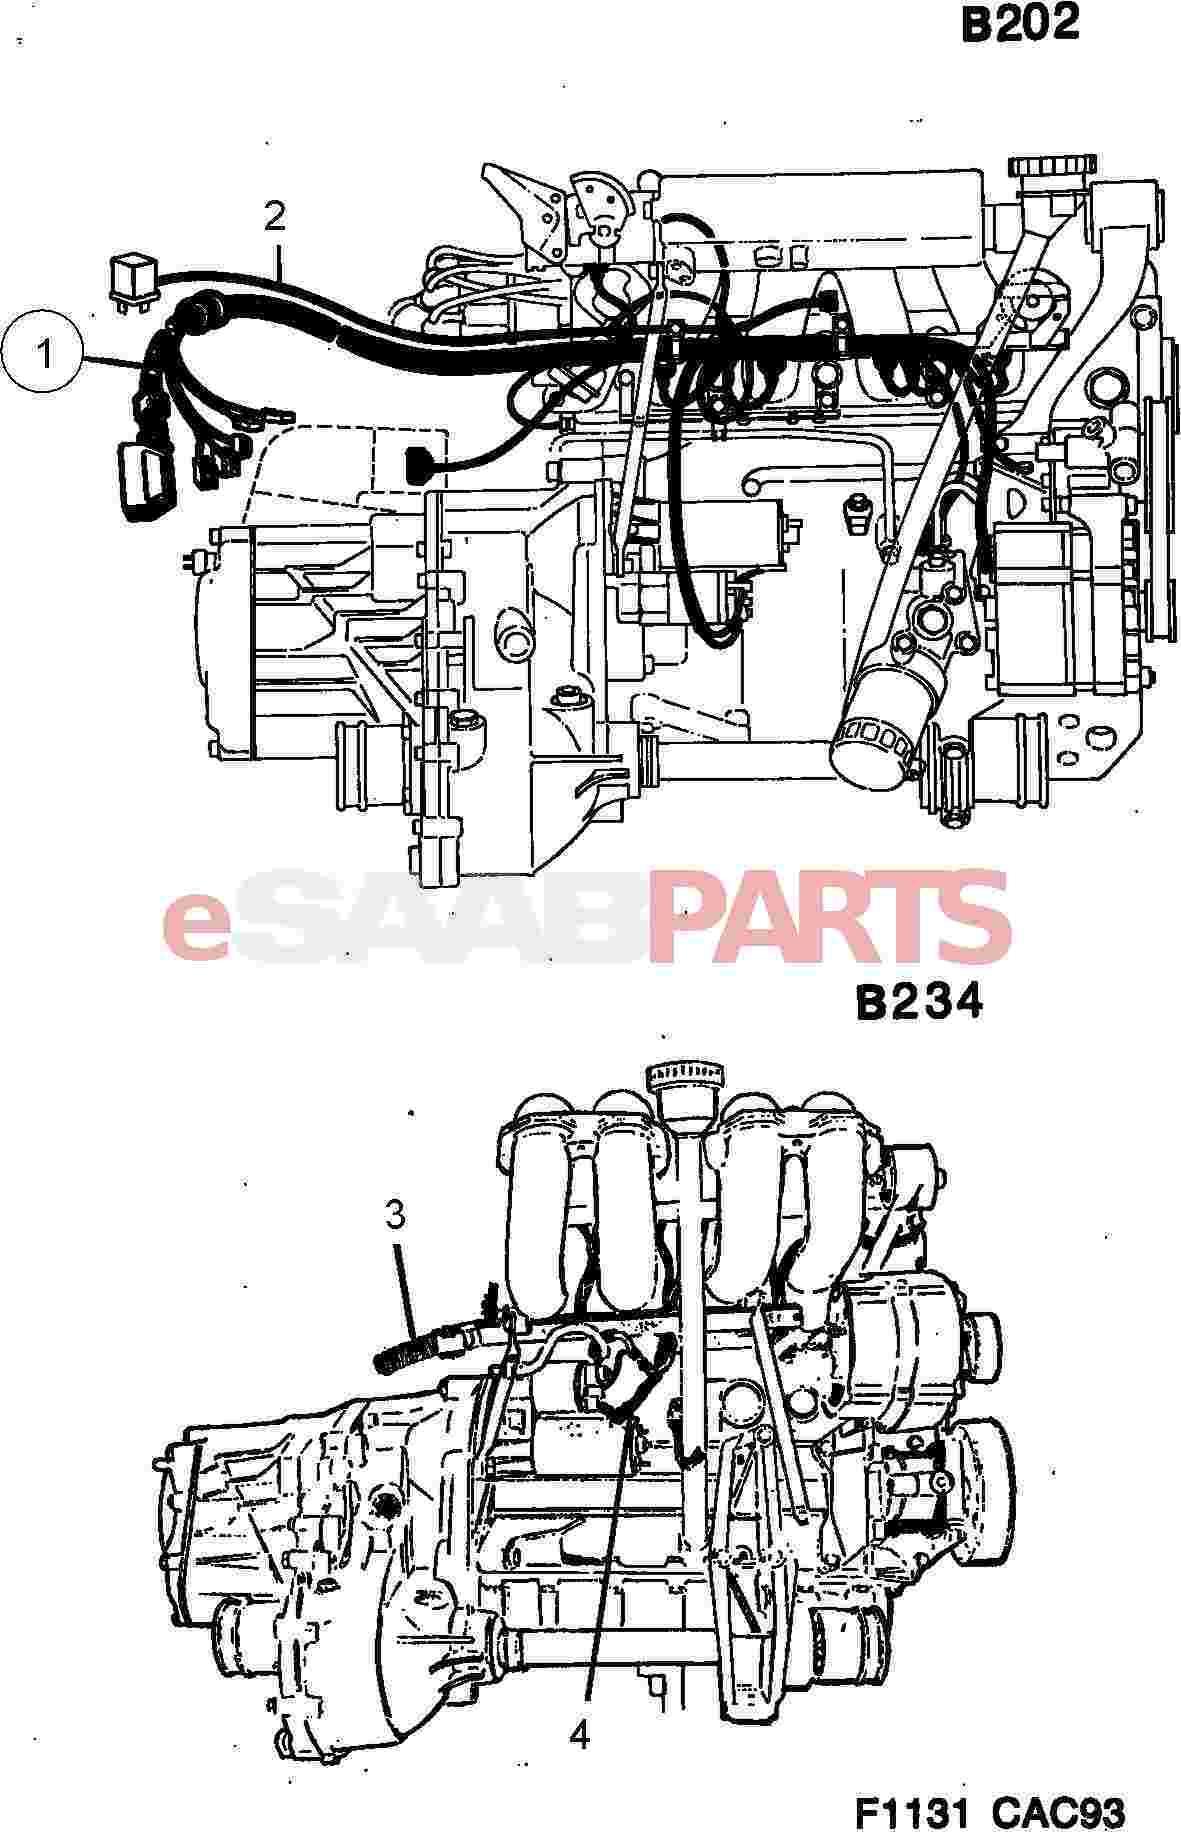 hight resolution of esaabparts com saab 9000 u003e electrical parts u003e wiring harness u003e engine saab 9000 engine wiring harness saab 9000 wiring harness